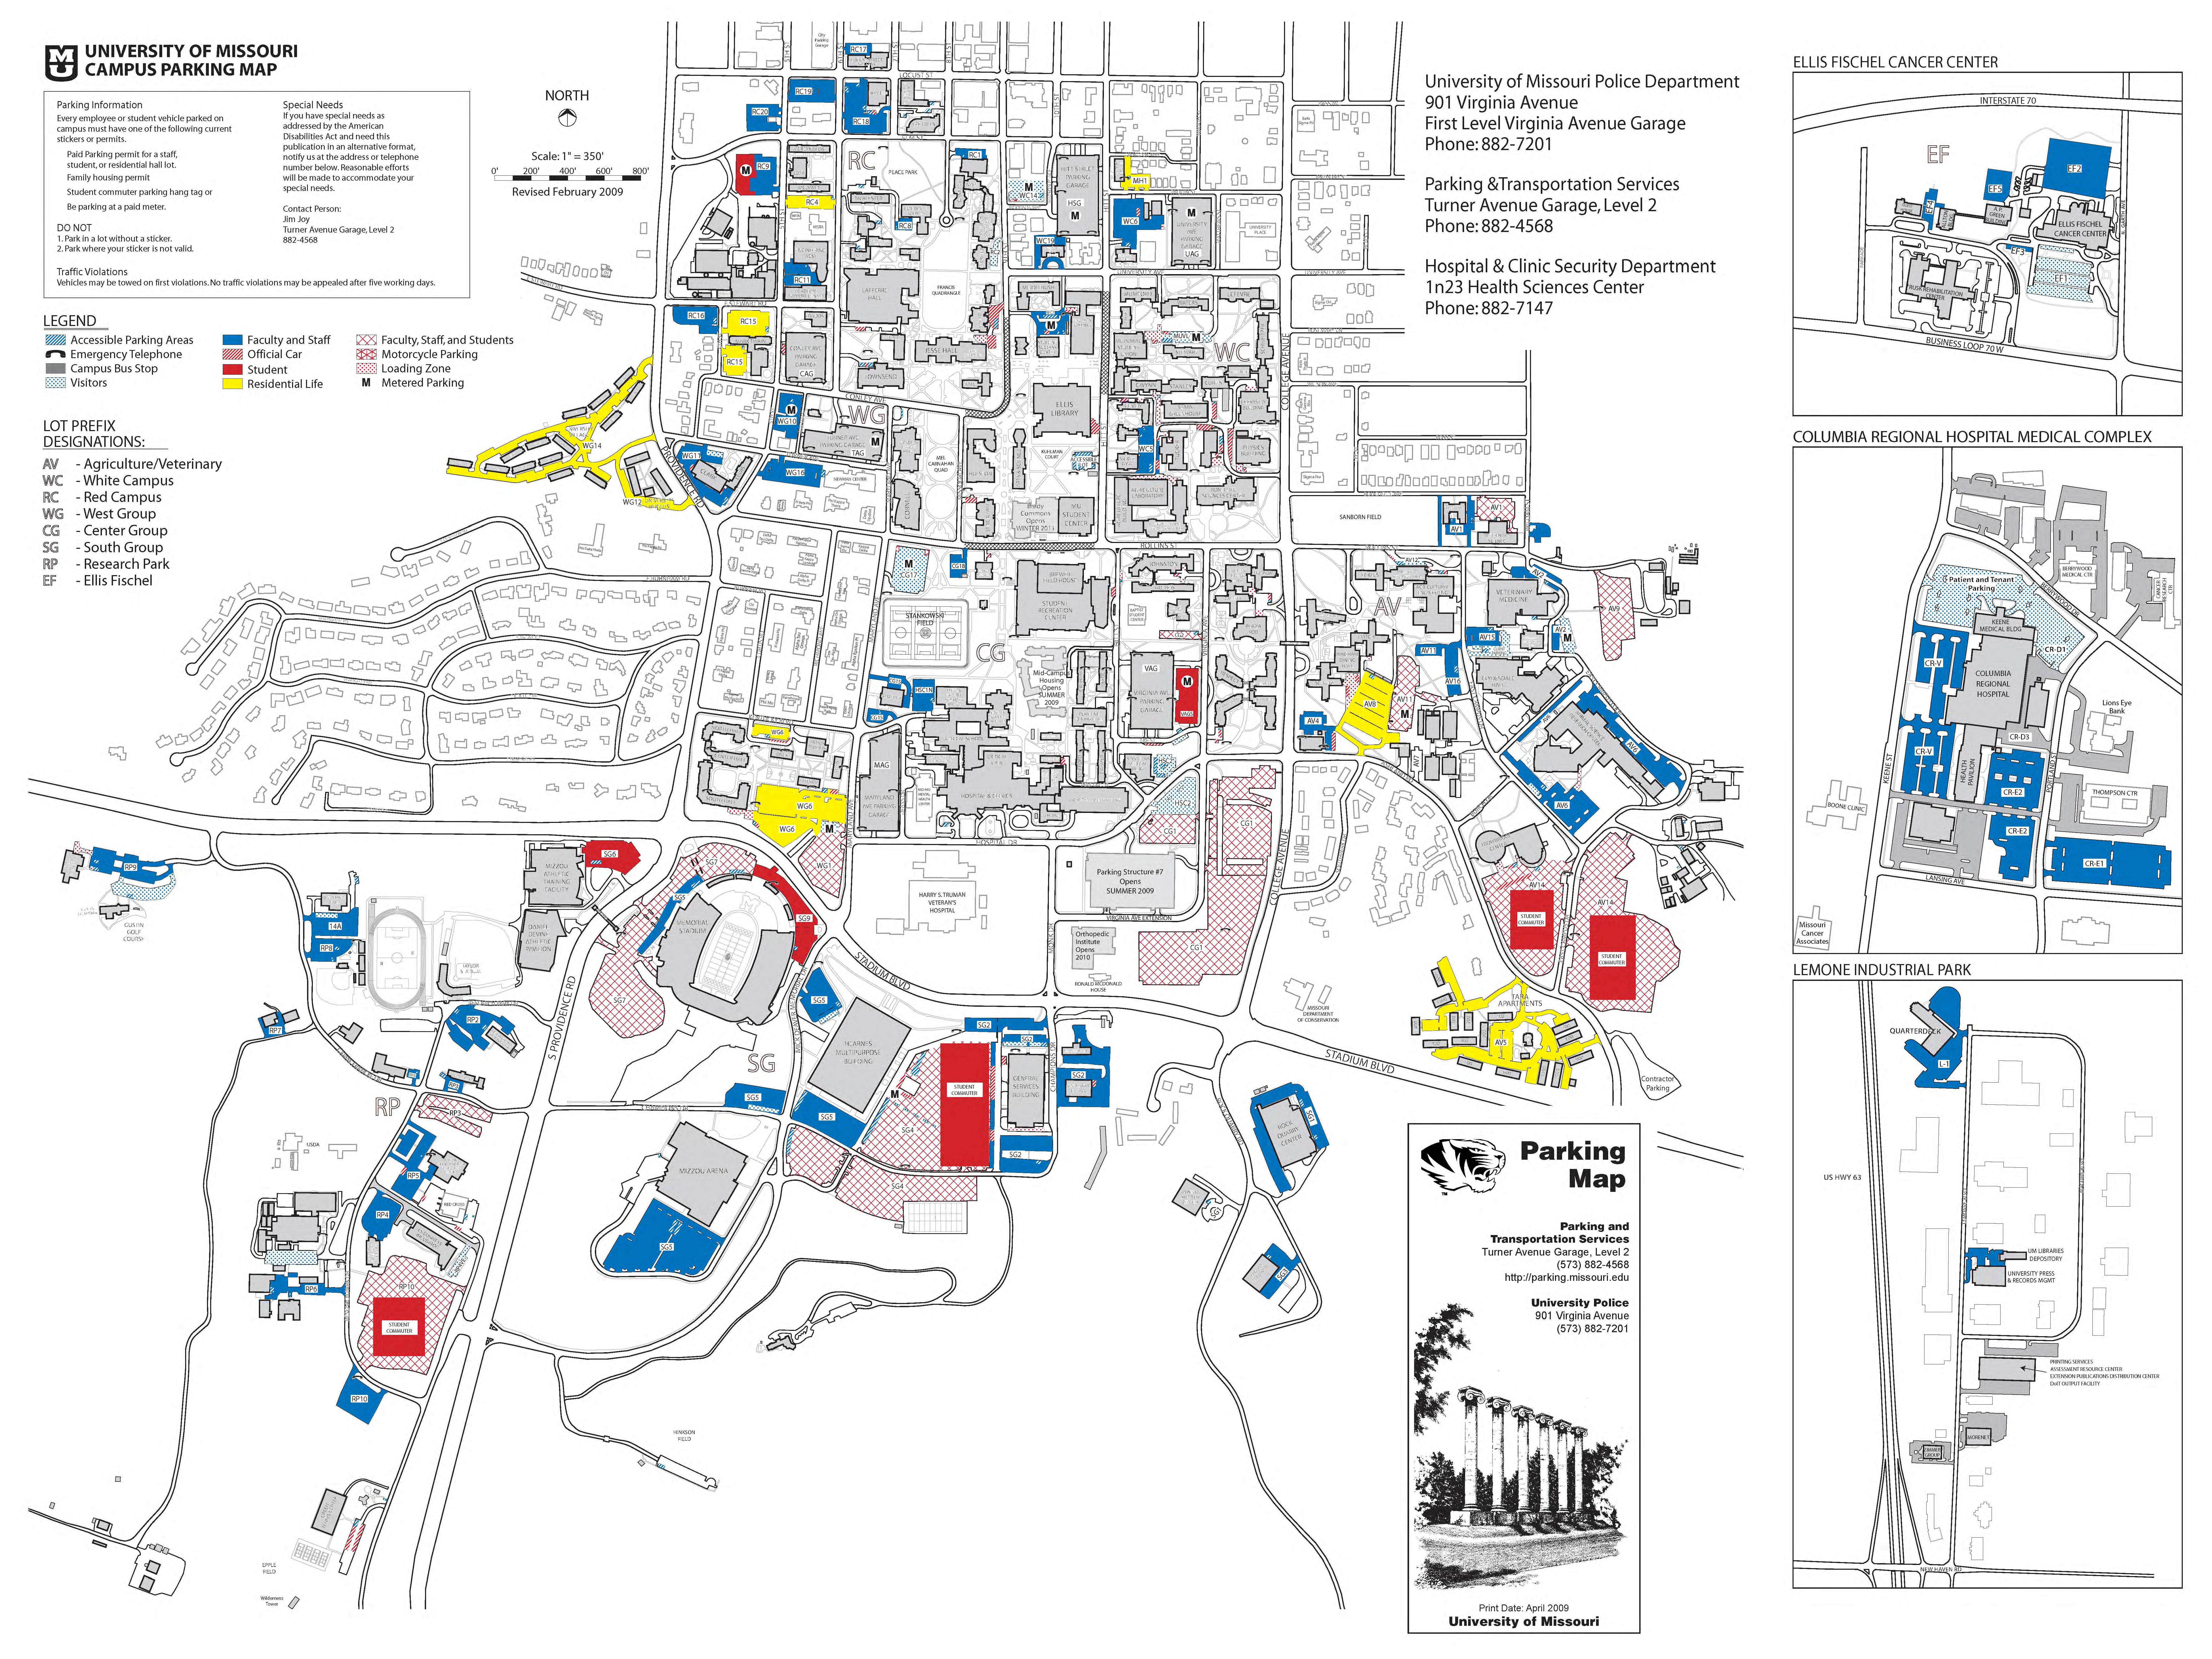 University Of Missouri Campus Parking Map